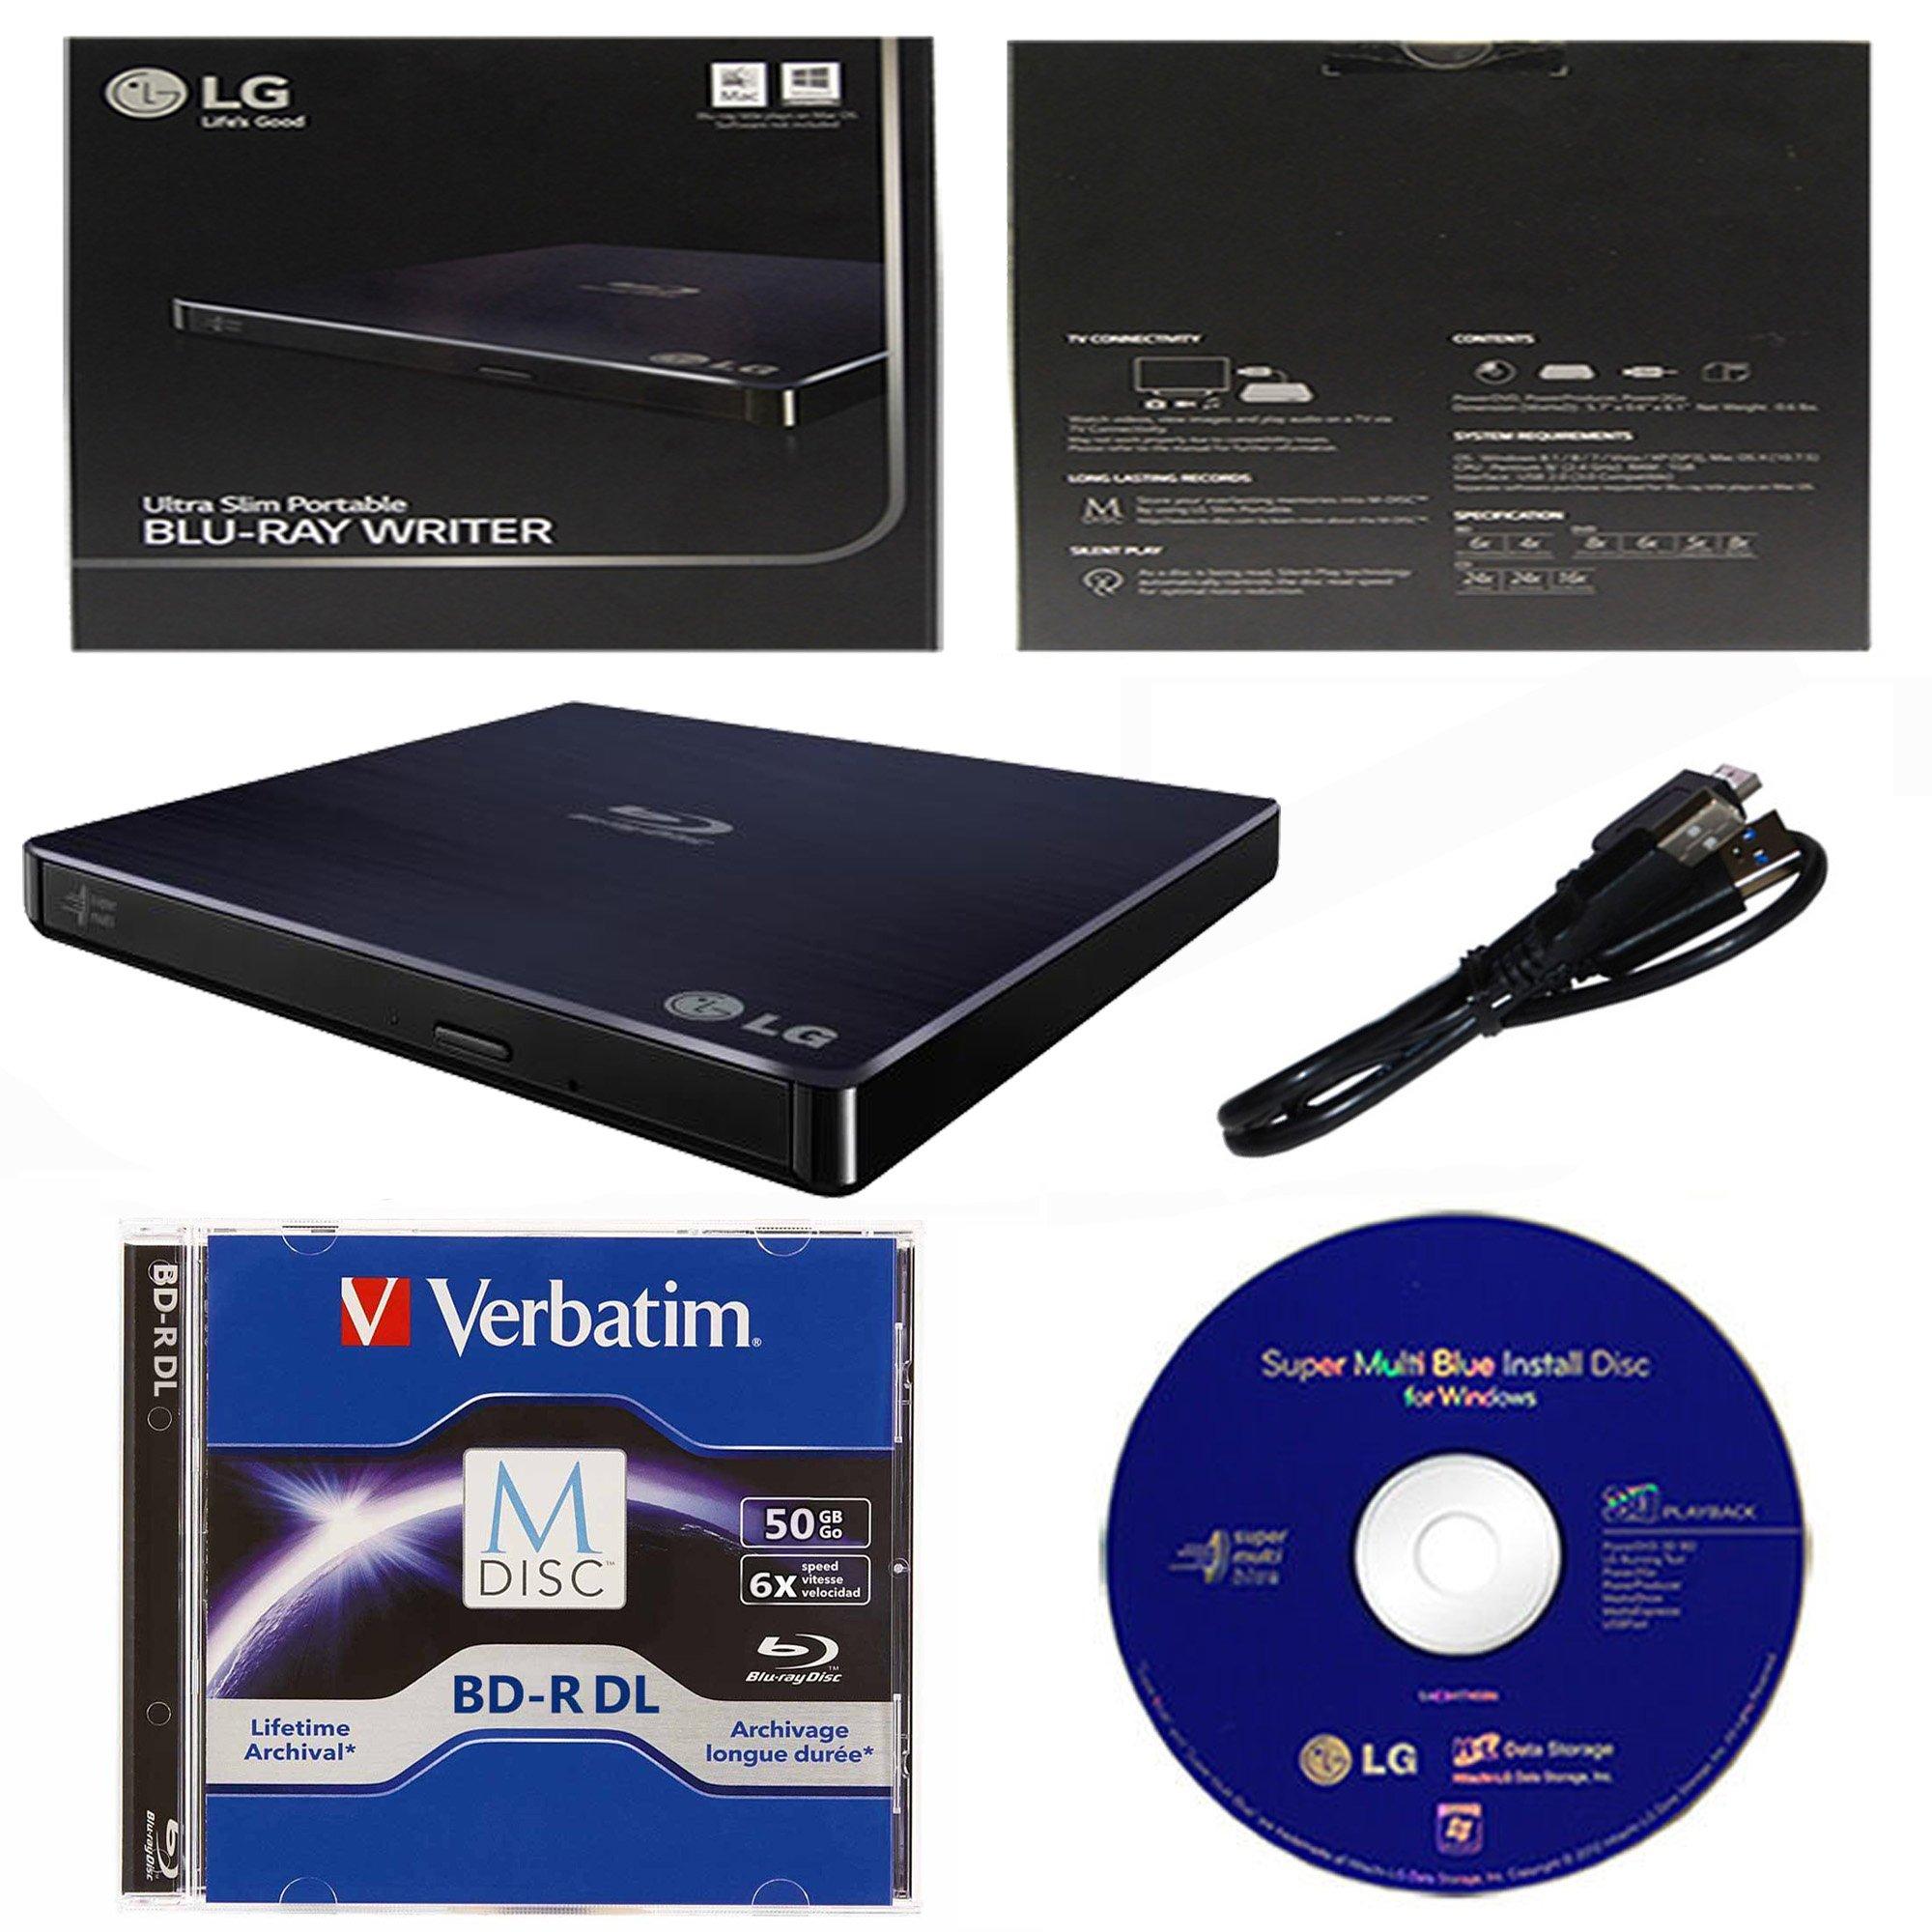 LG 6x WP50NB40 External Portable Blu-ray Burner in